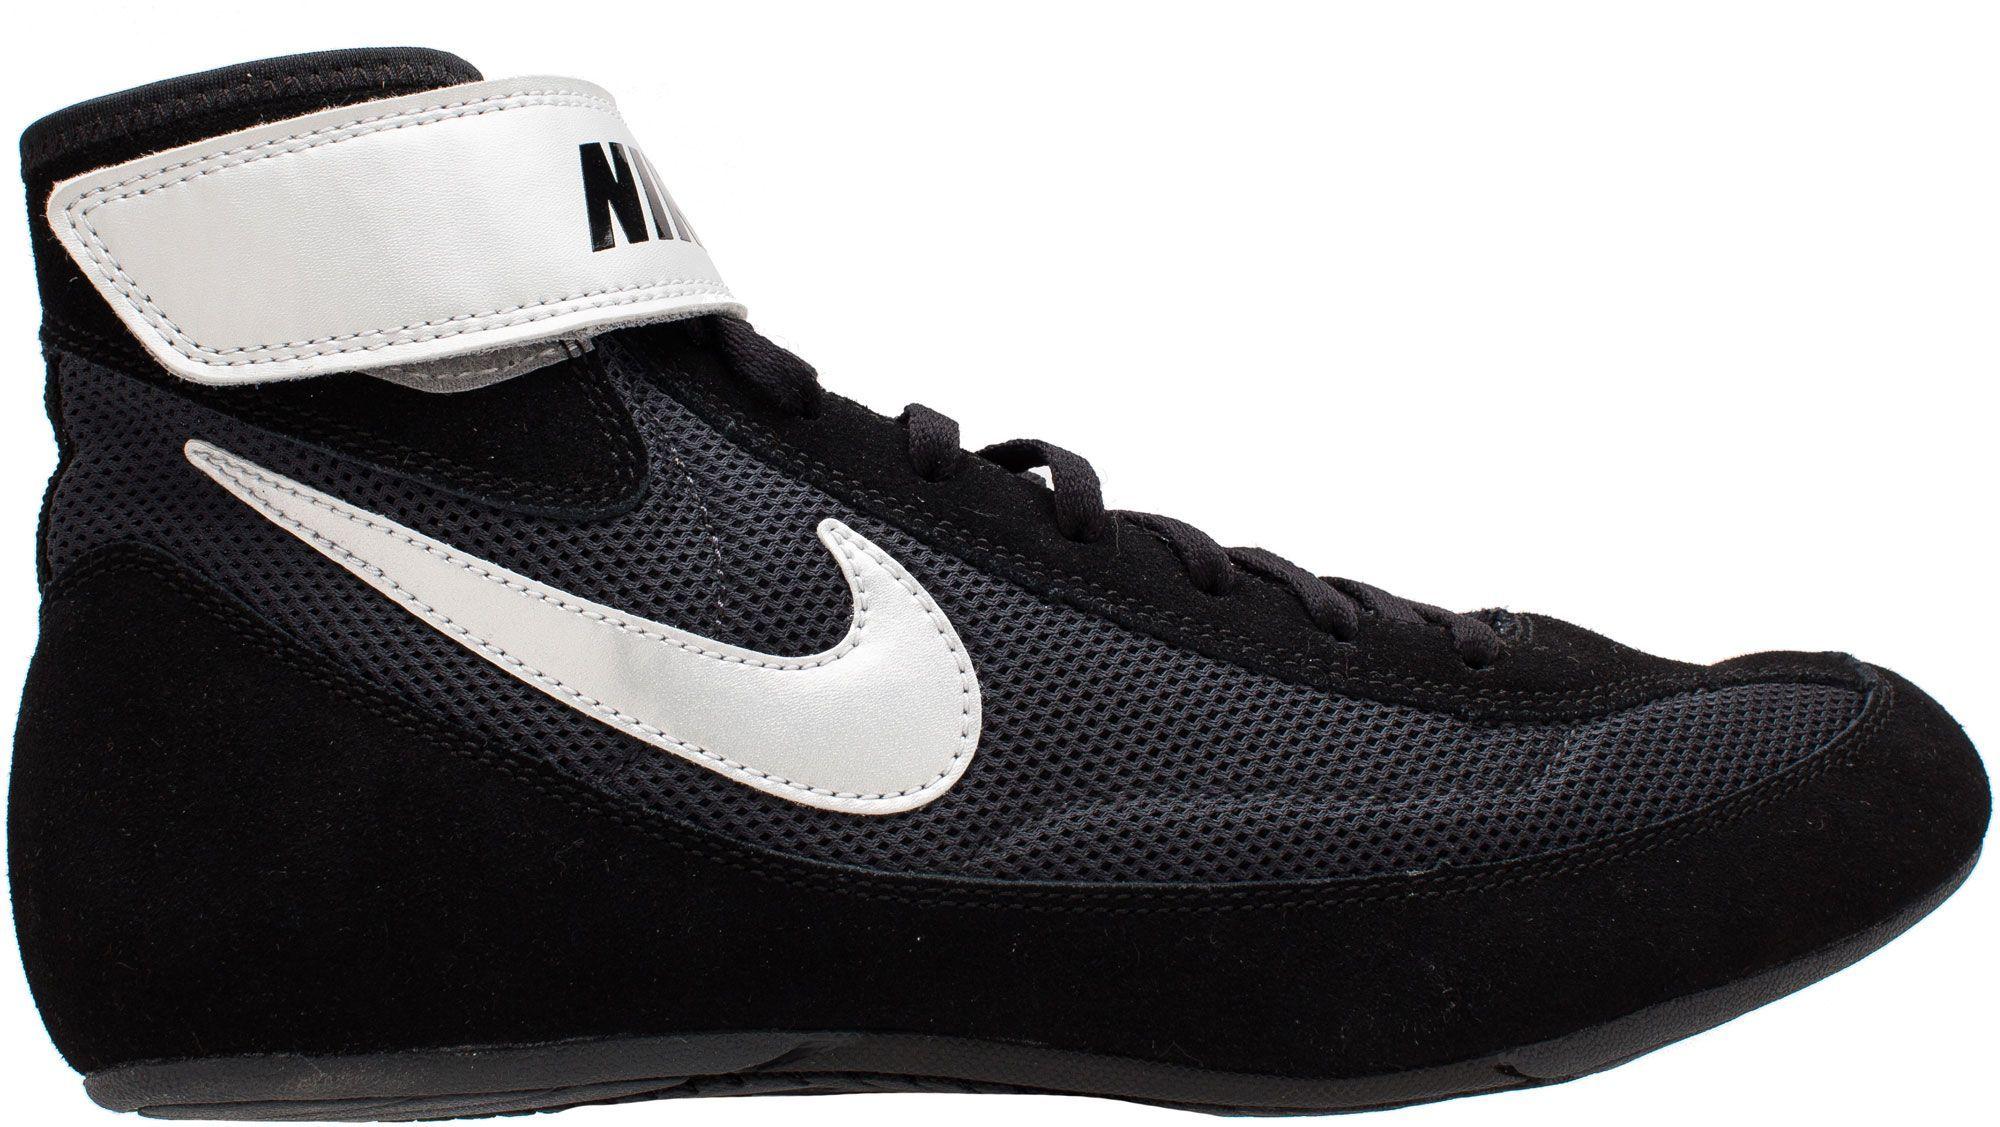 Nike mens speed sweep vii wrestling shoes wrestling